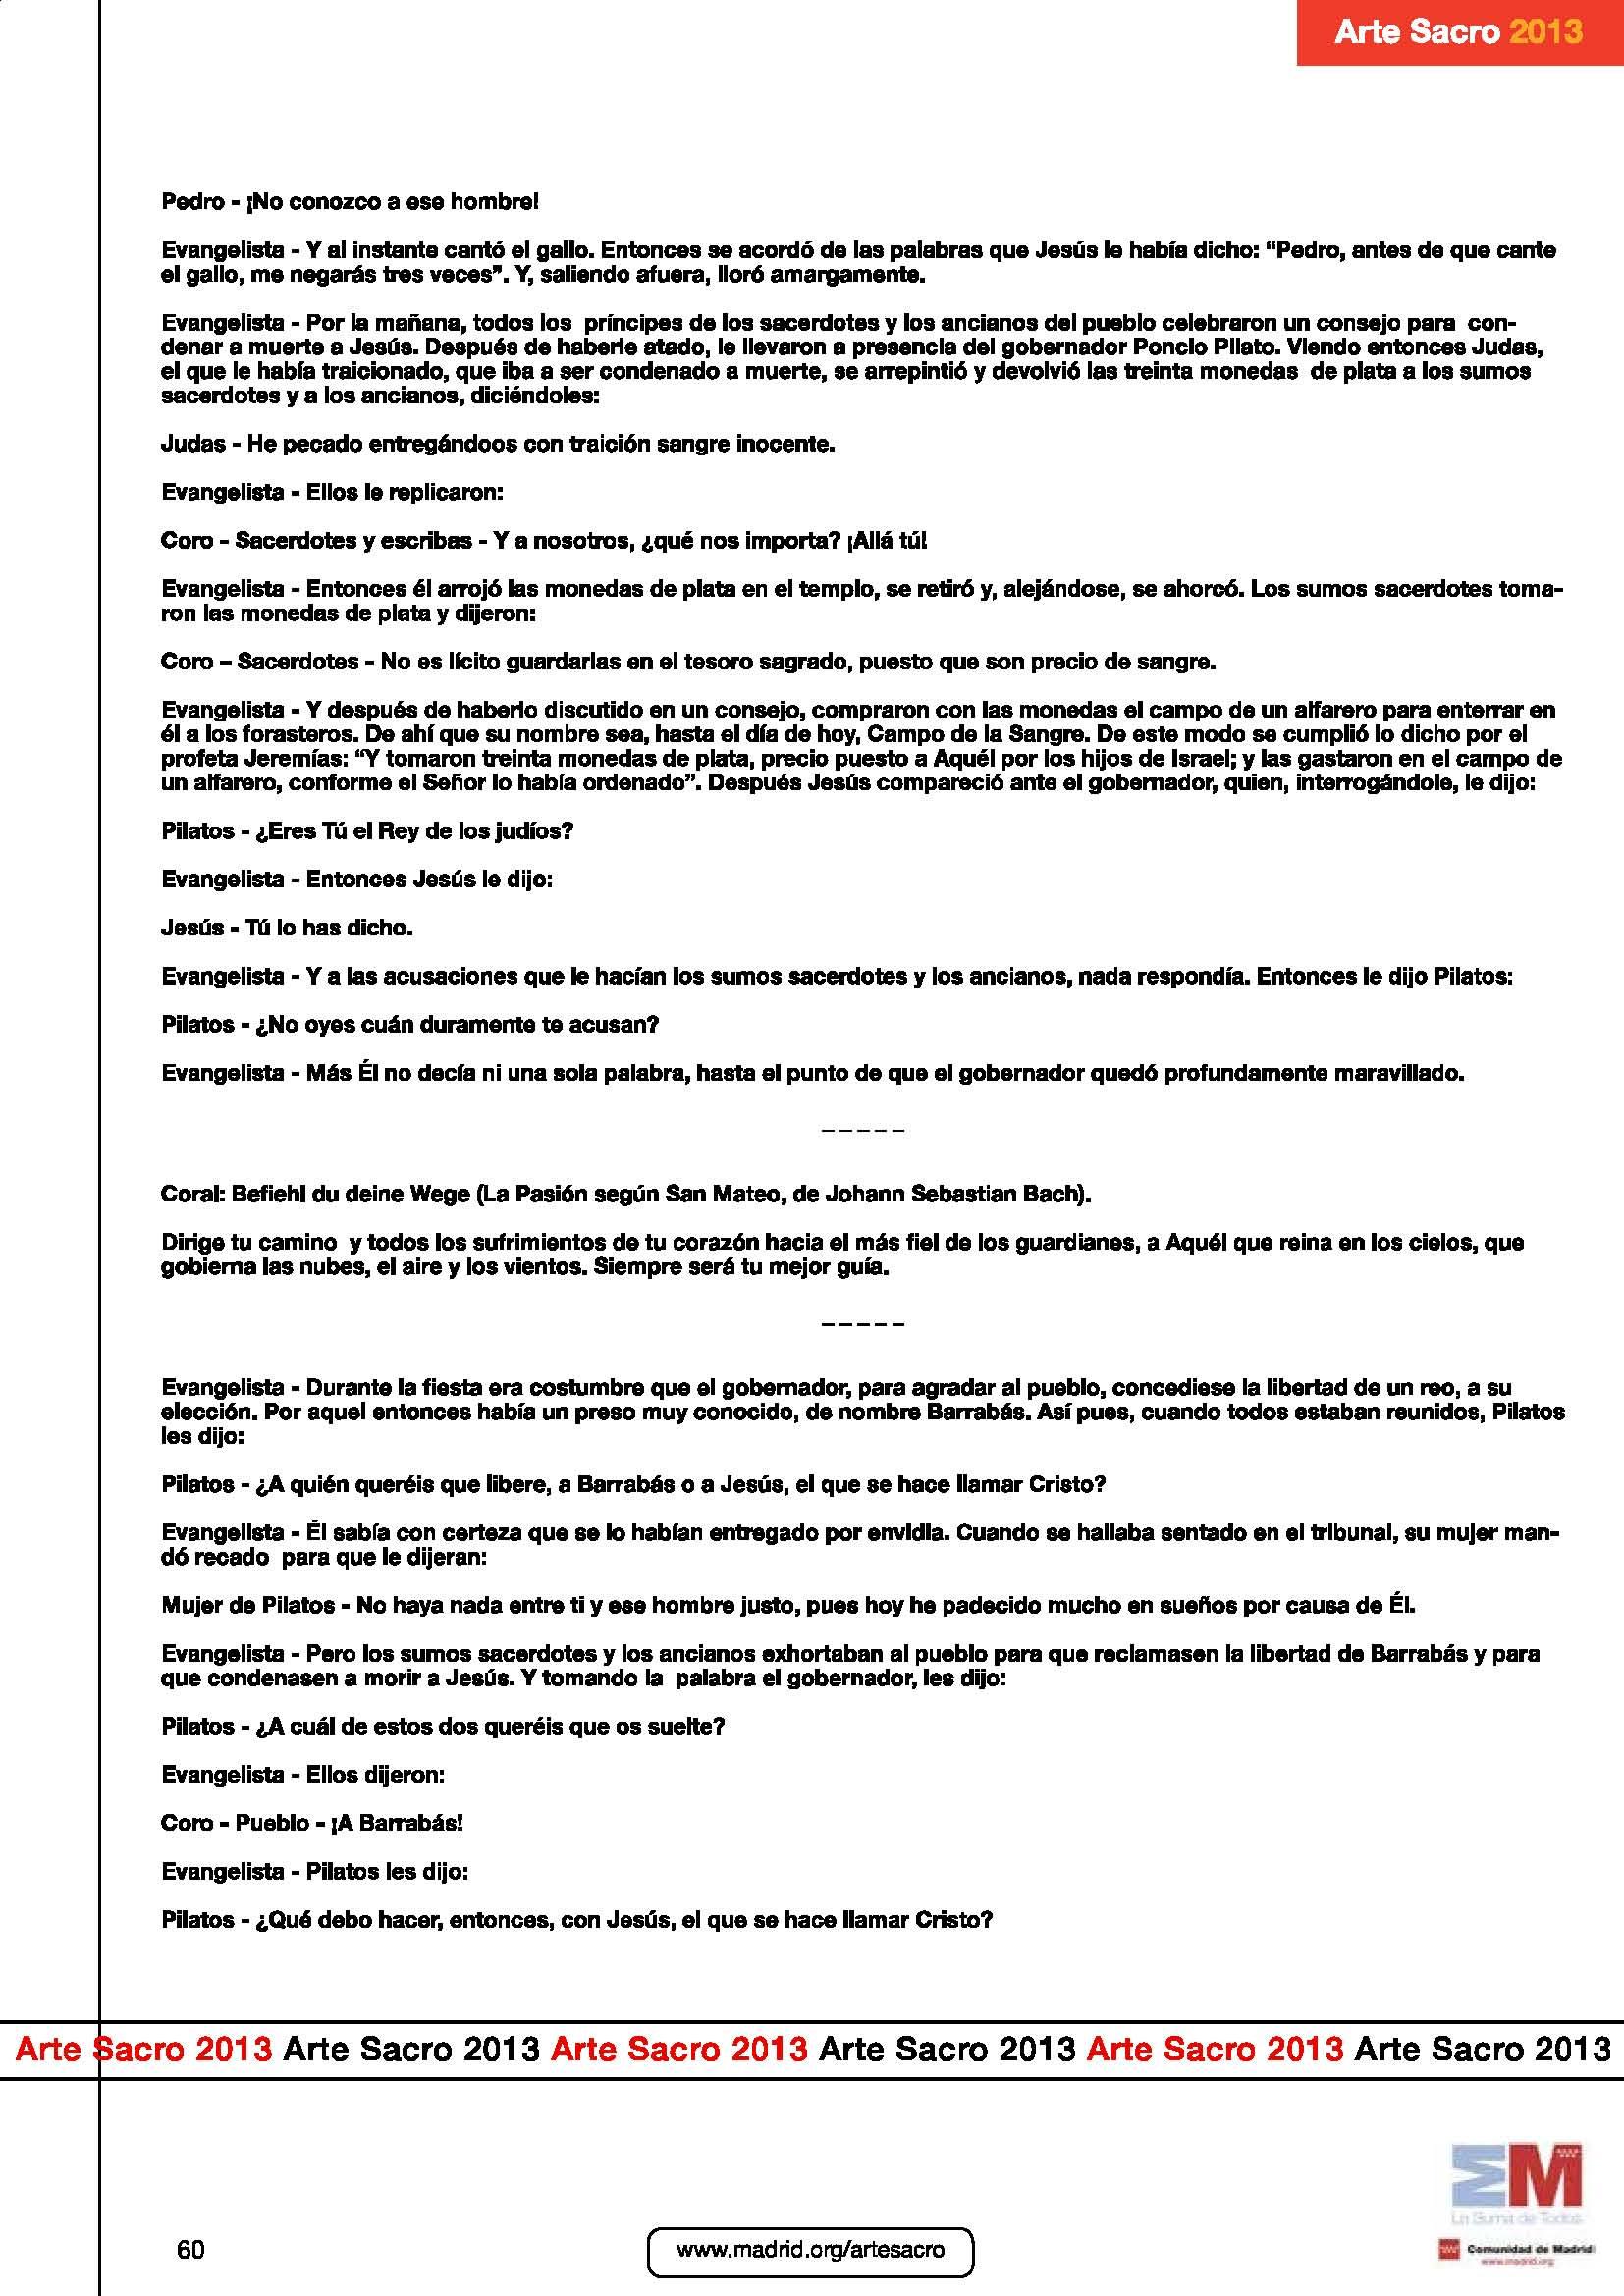 dossier_completo_Página_060